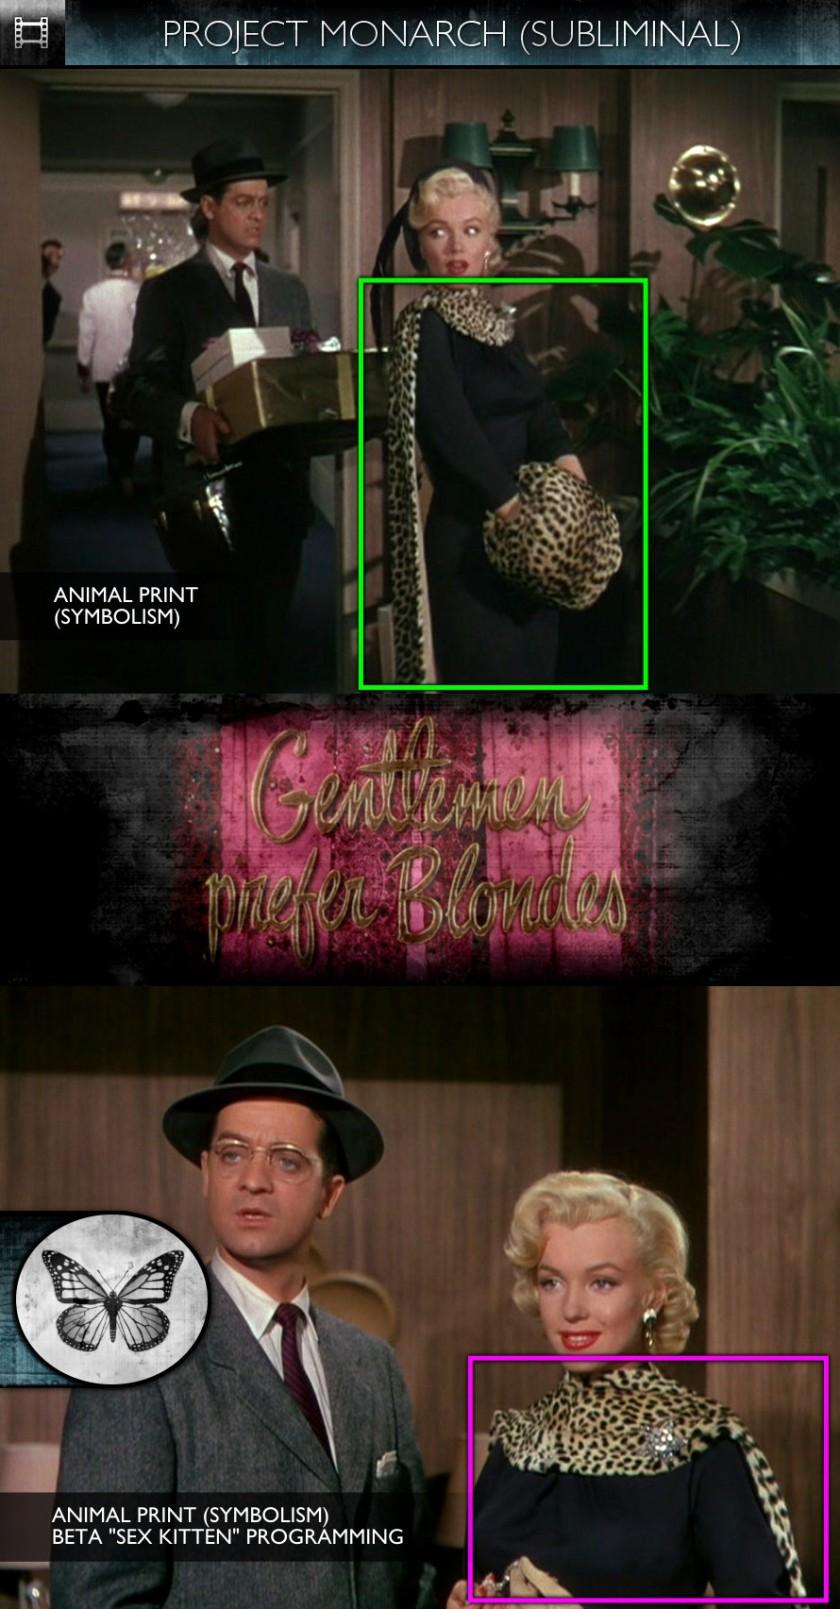 Gentlemen Prefer Blondes (1953) - Project Monarch Beta Programming - Marilyn Monroe